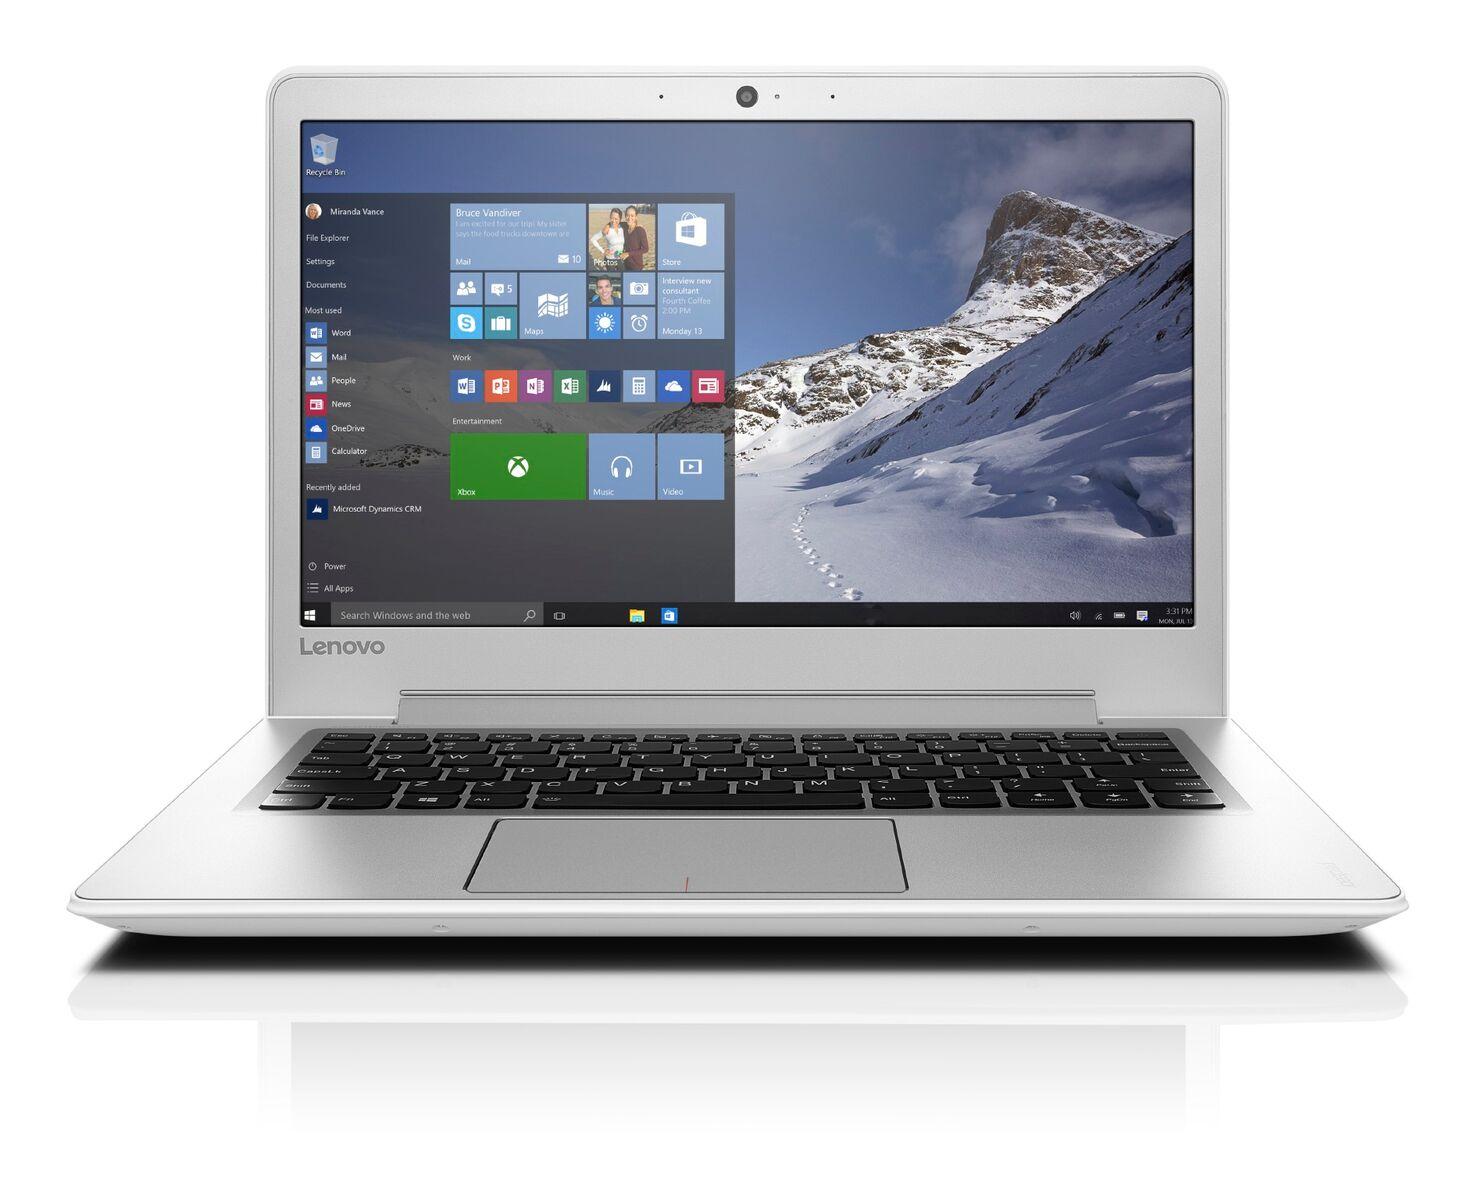 "Lenovo IdeaPad 510S-13IKB i5-7200U 3,10GHz/4GB/SSD 256GB/13,3"" FHD/IPS/AG/WIN10 bílá 80V0001ACK"